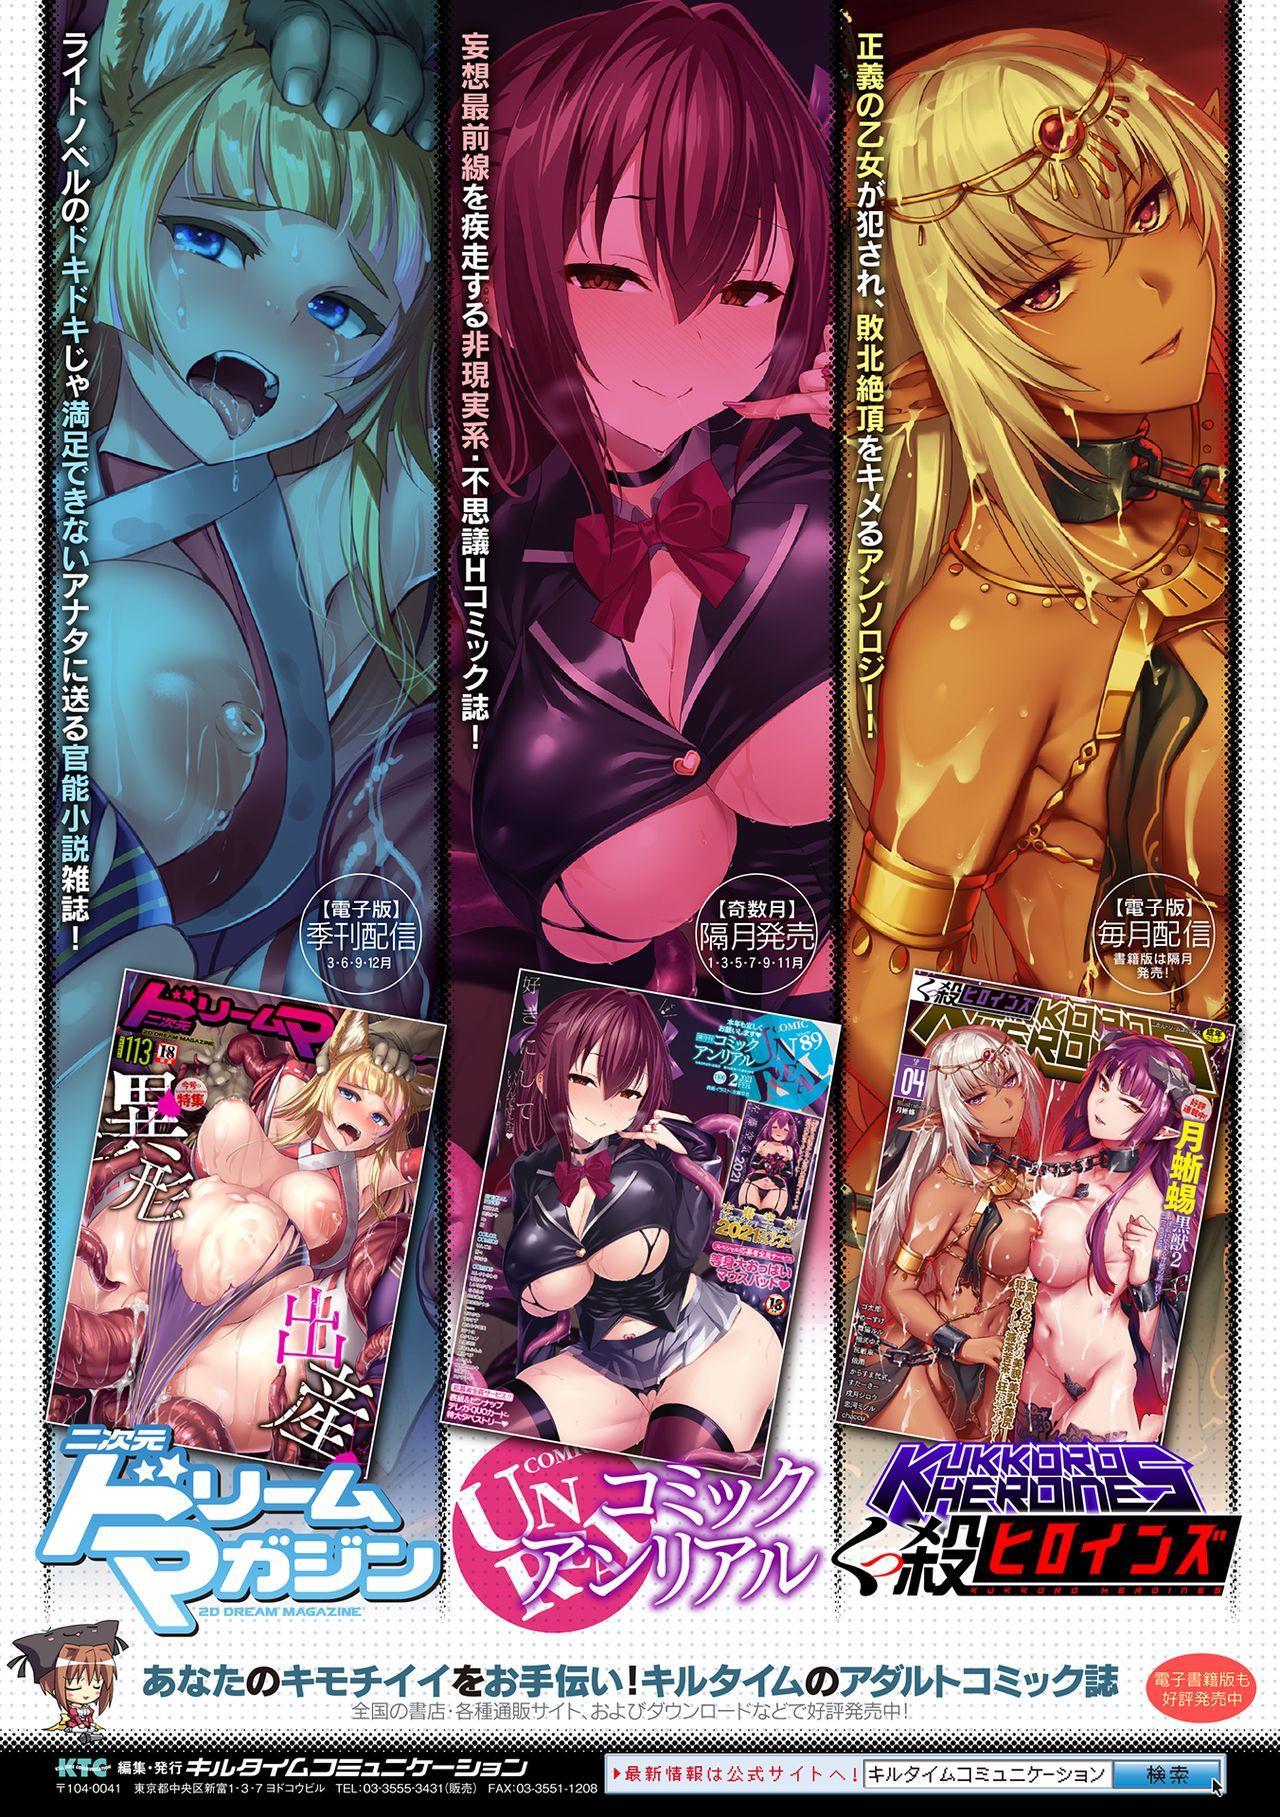 [Anthology] 2D Comic Magazine Mesugaki Succubus Seisai Namaiki Aka-chan Heya o Wakarase-bou de Kousei Knock Vol. 2 [Digital] 89